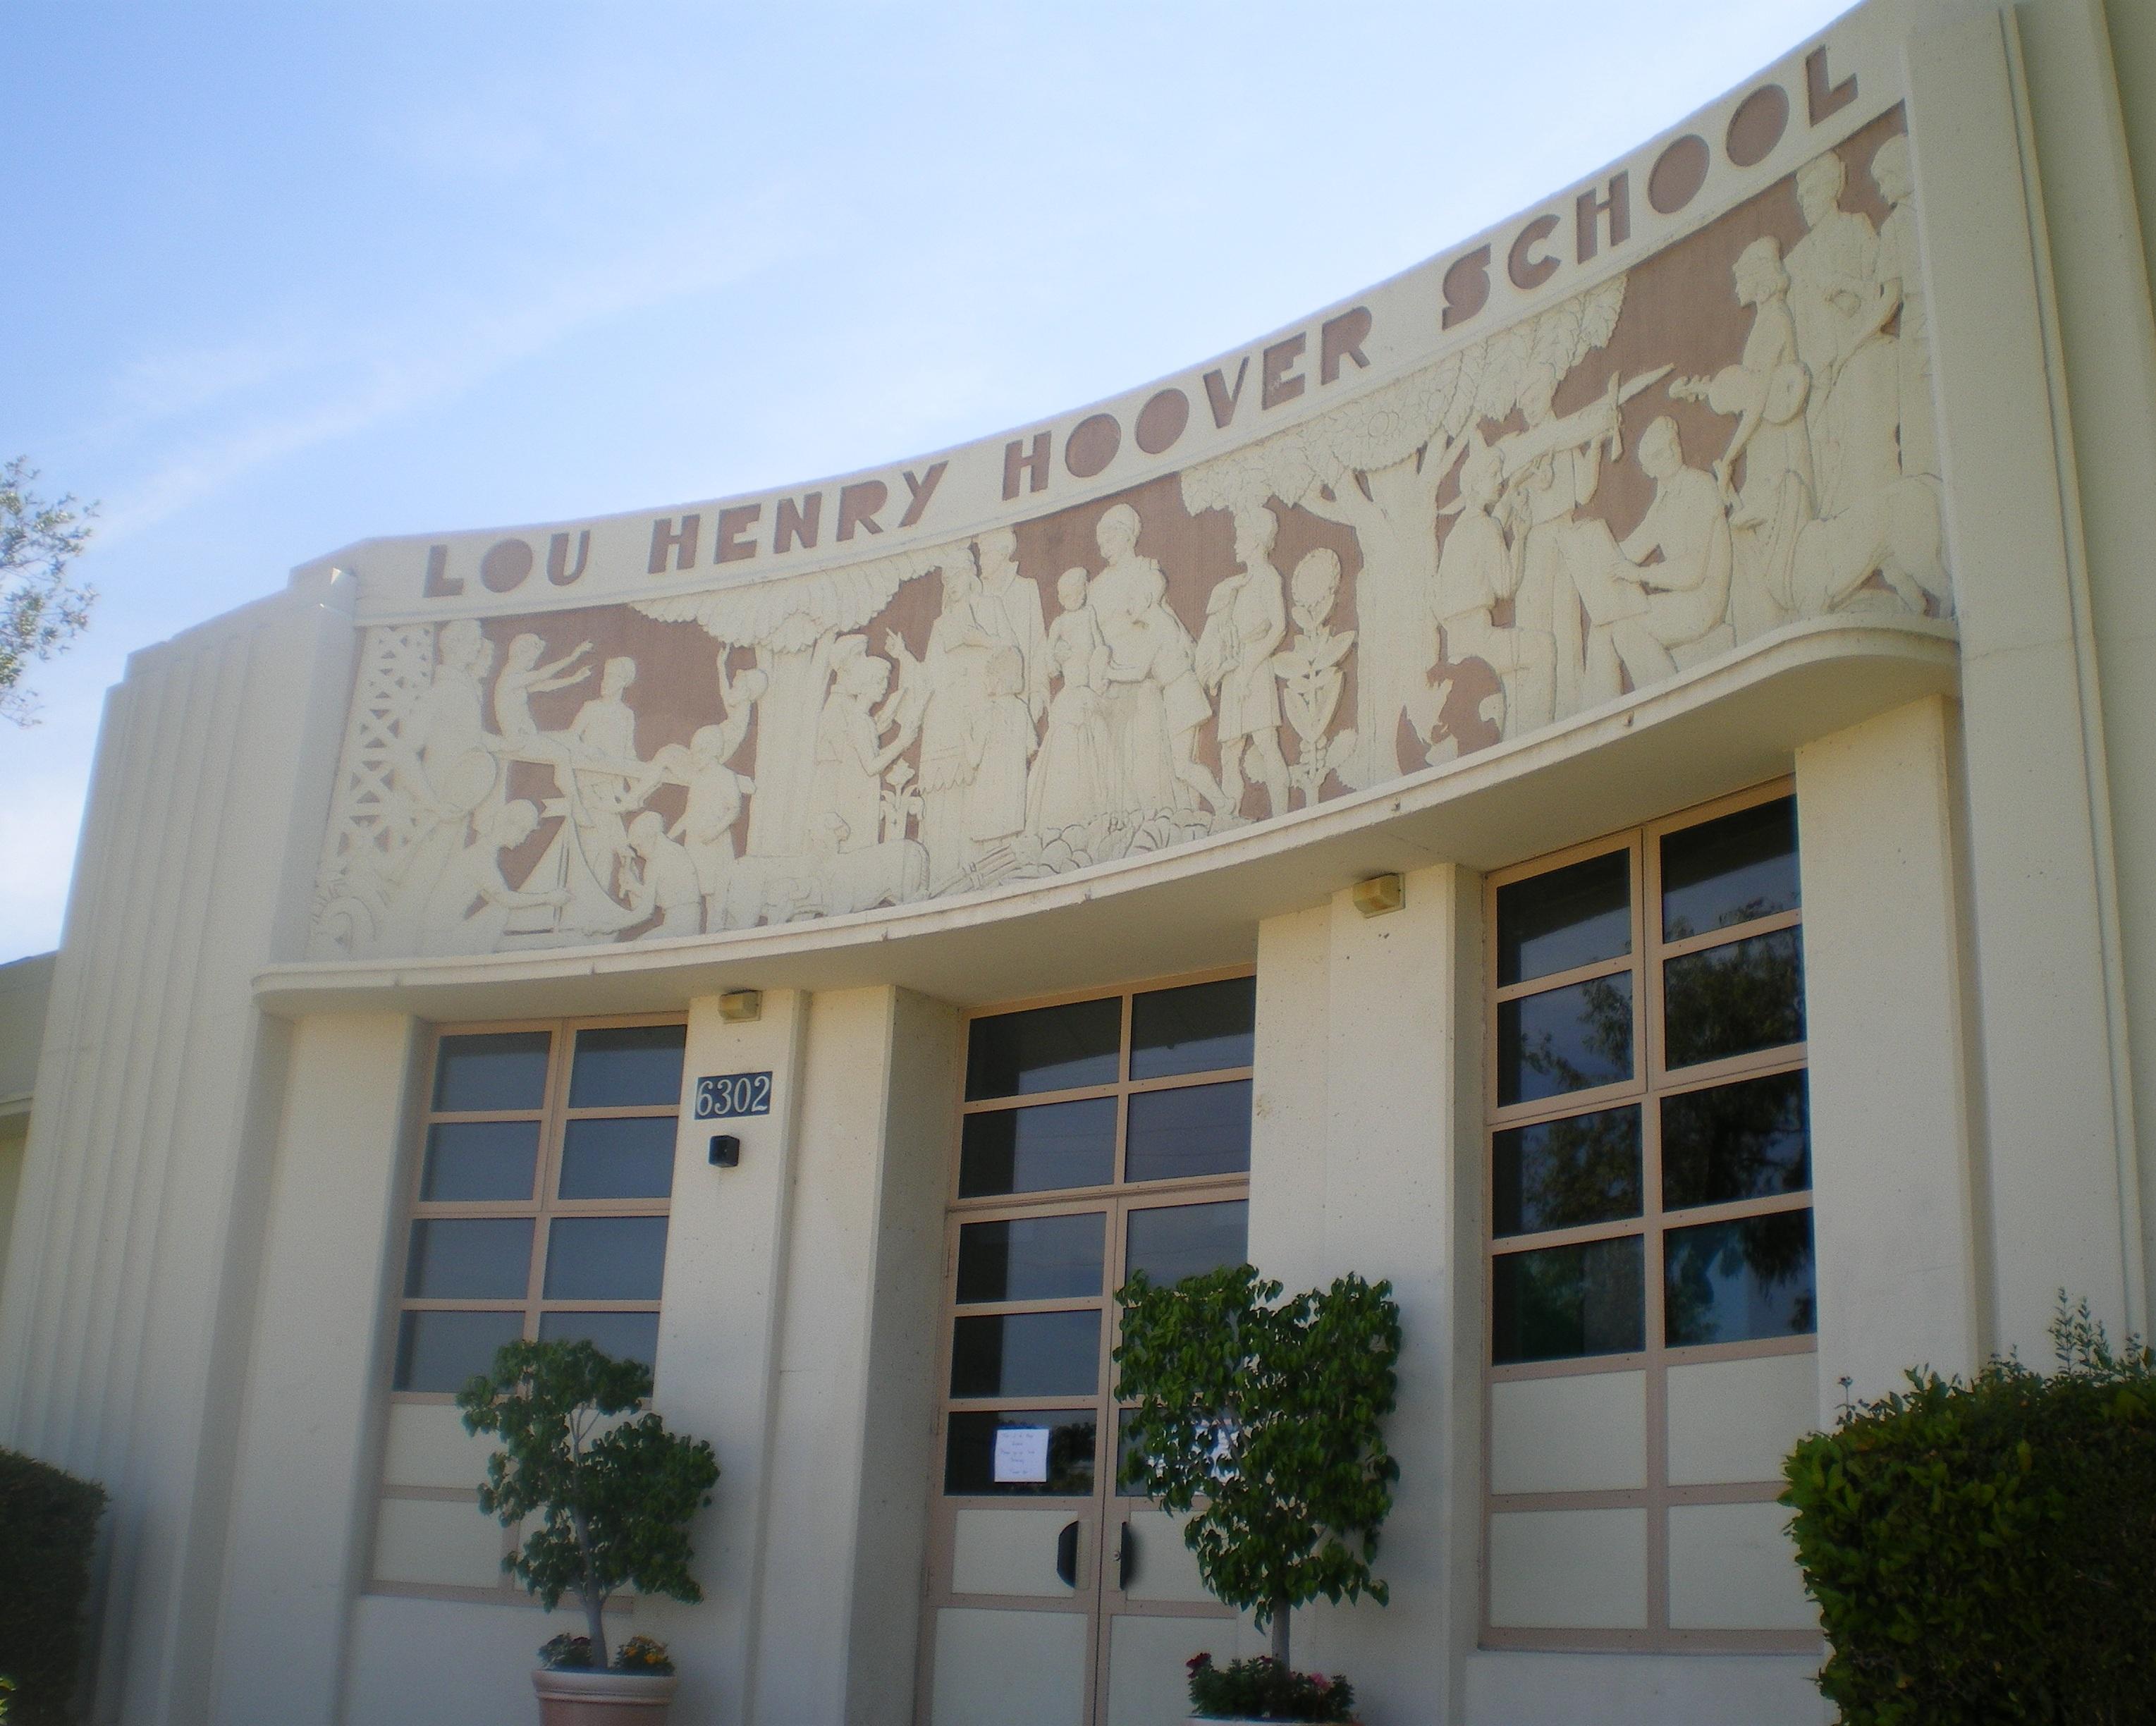 Whittier High School